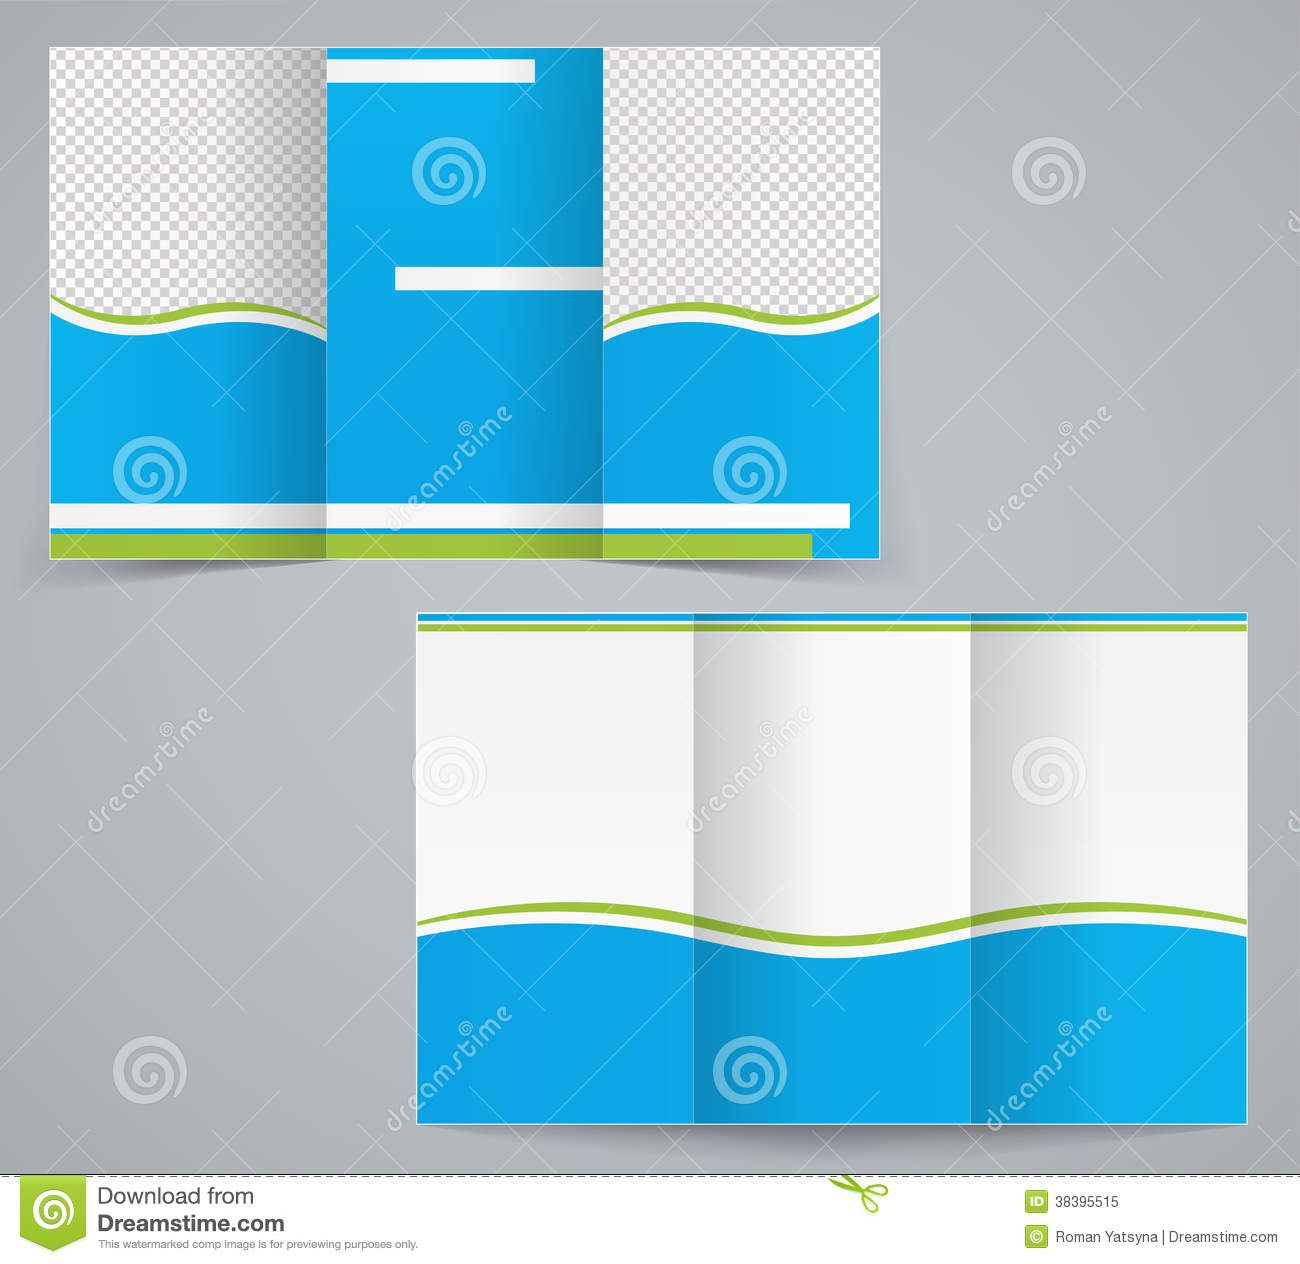 008 Top Tri Fold Brochure Template Word Idea  2010 2007 FreeFull